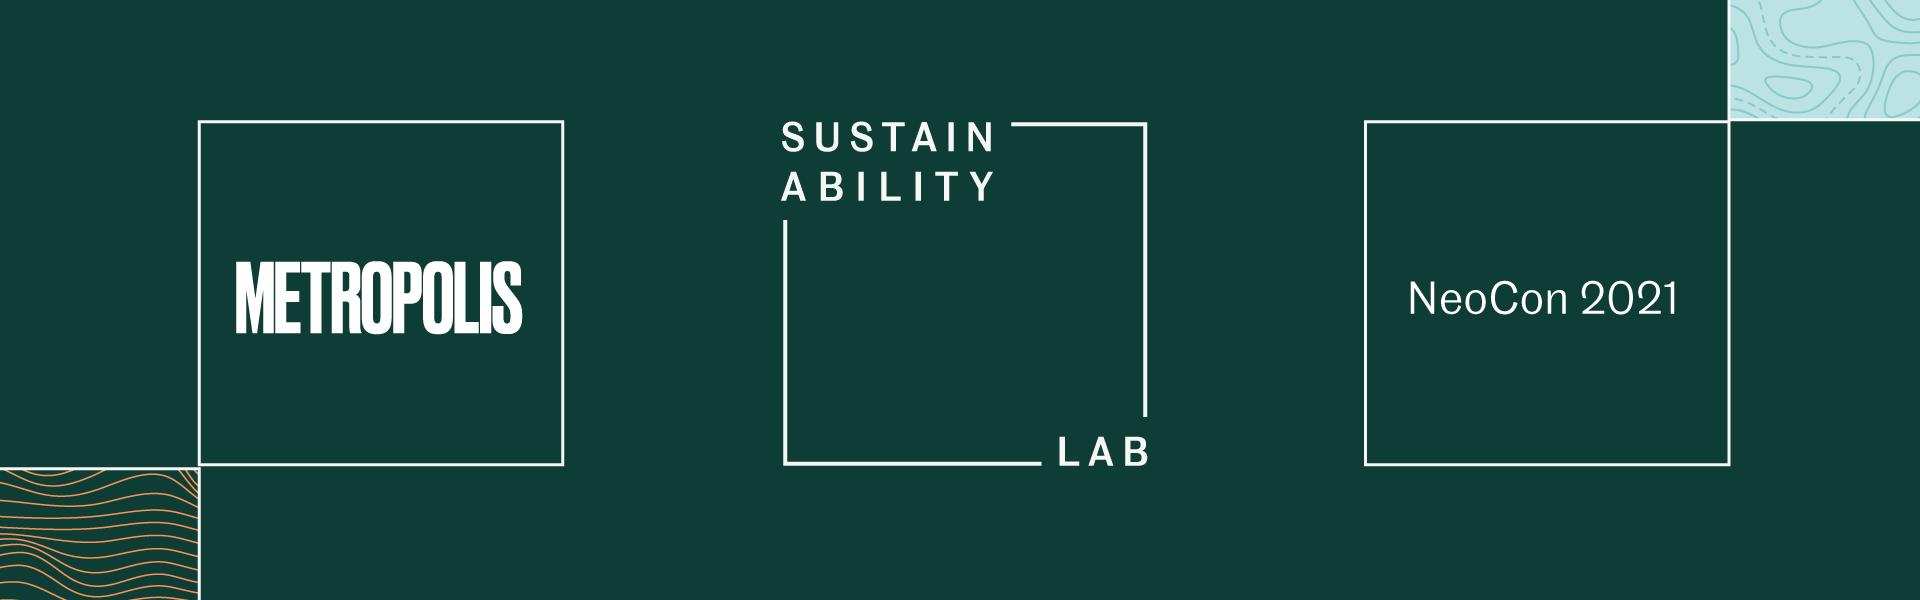 Metropolis Sustainability Lab at NeoCon 2021